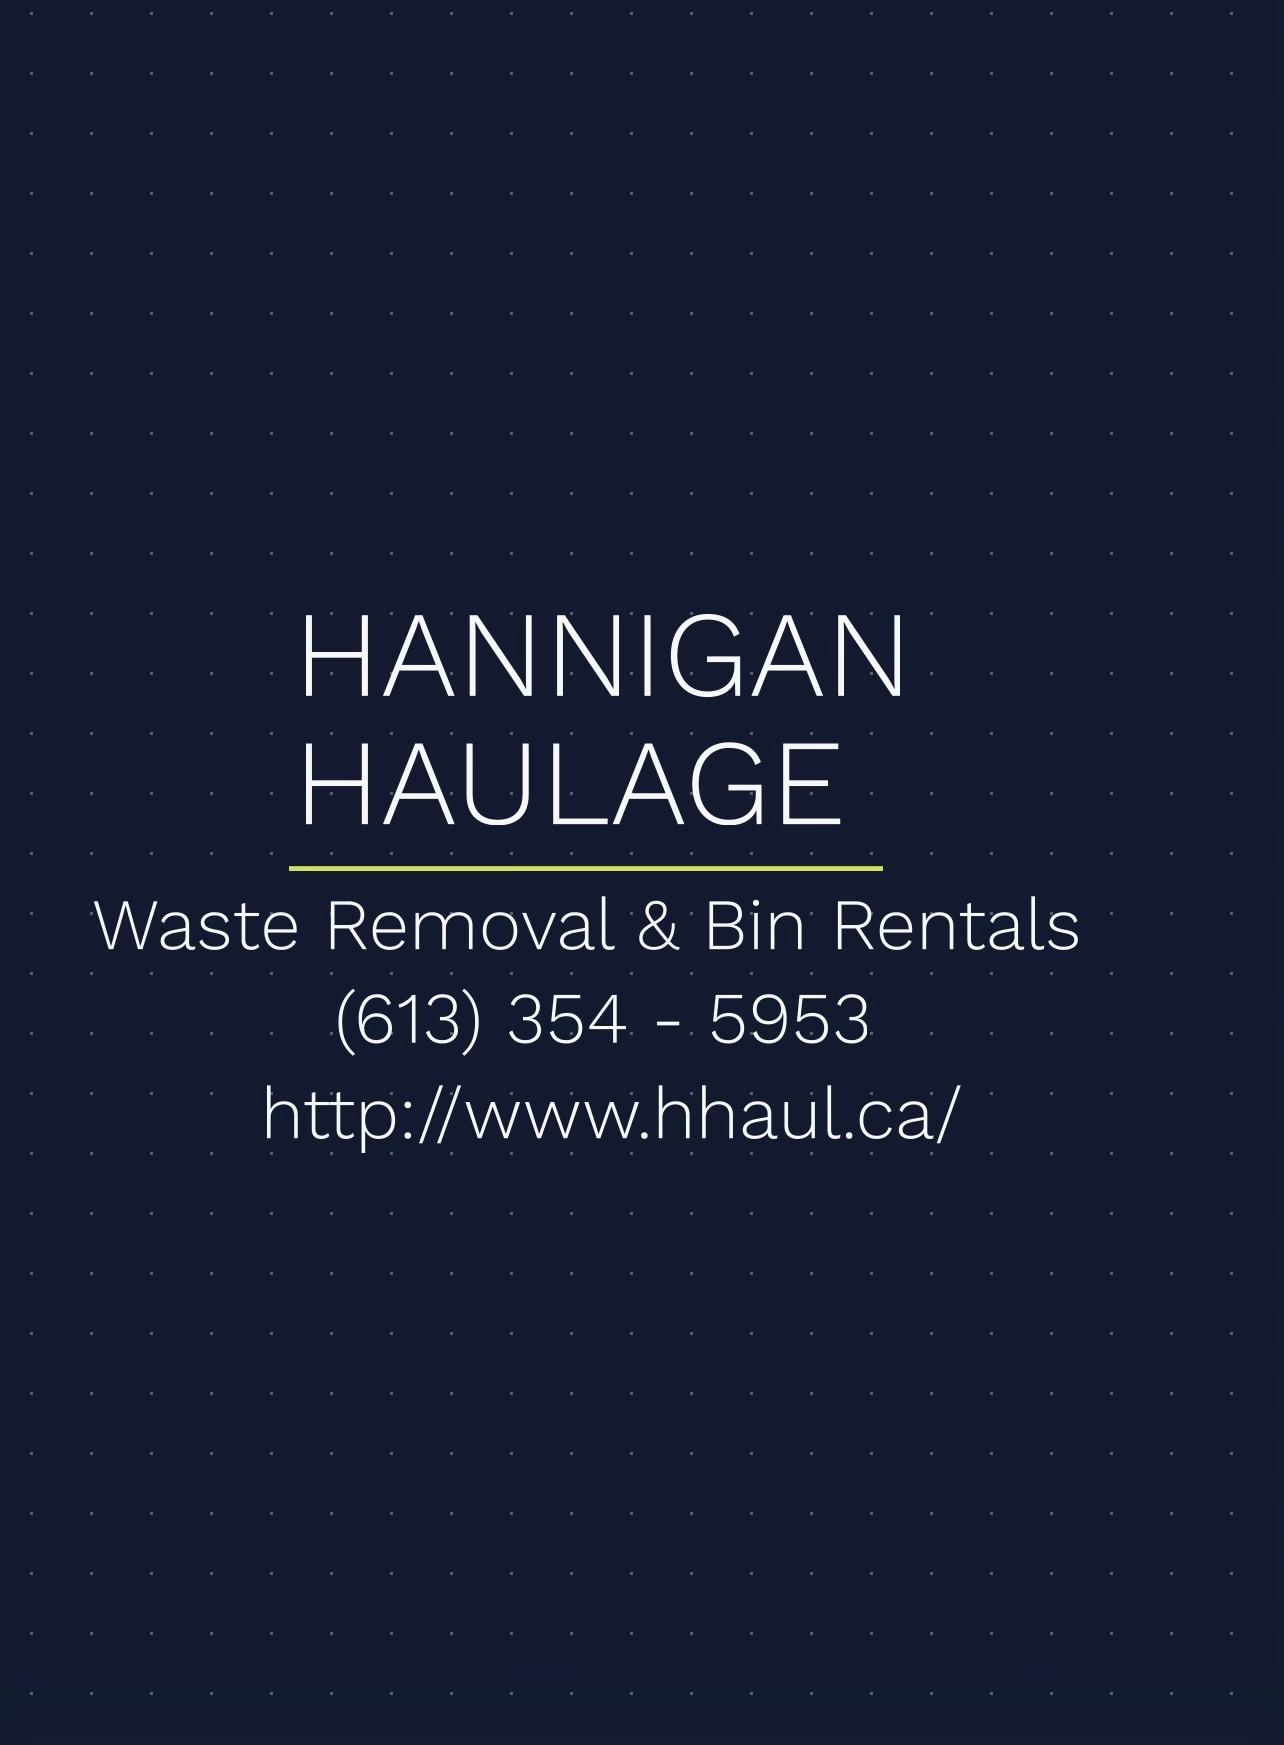 Hannigan Haulage